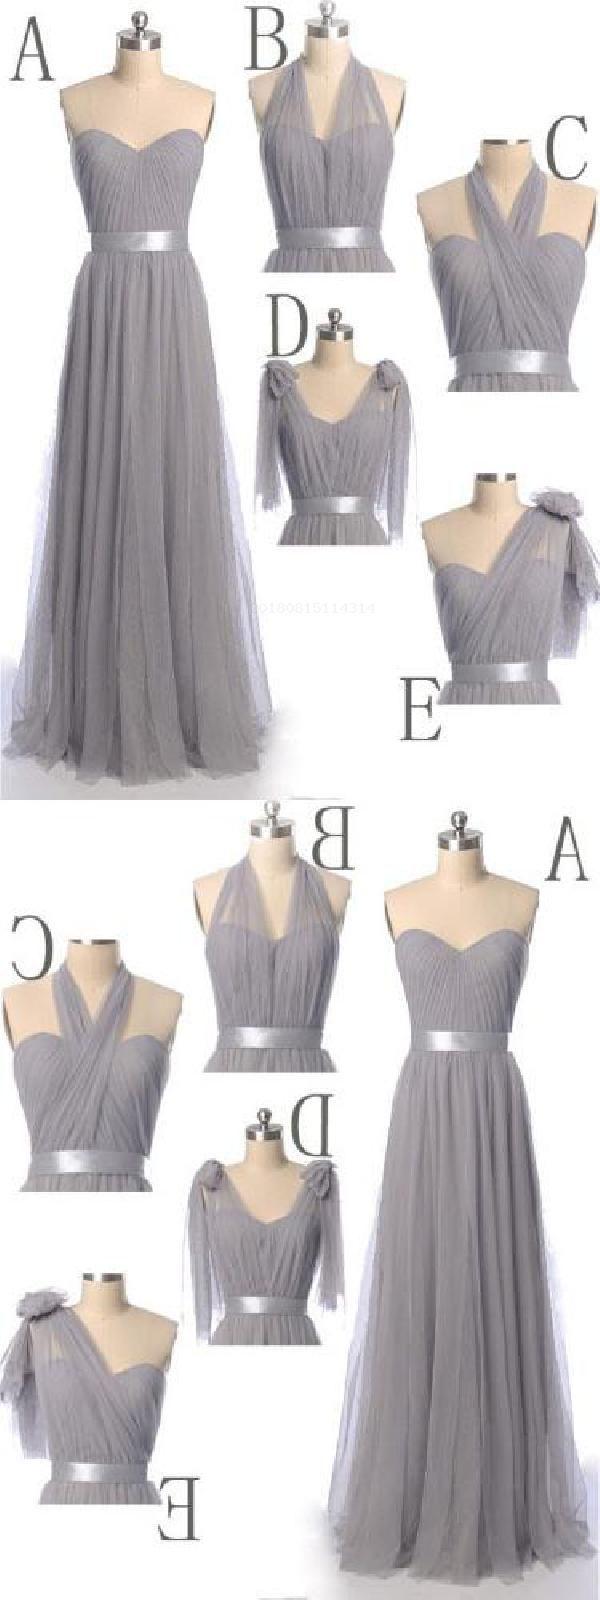 Discount Comfortable Grey Bridesmaid Dresses Grey Convertible Grey Long Bridesmaid Dress